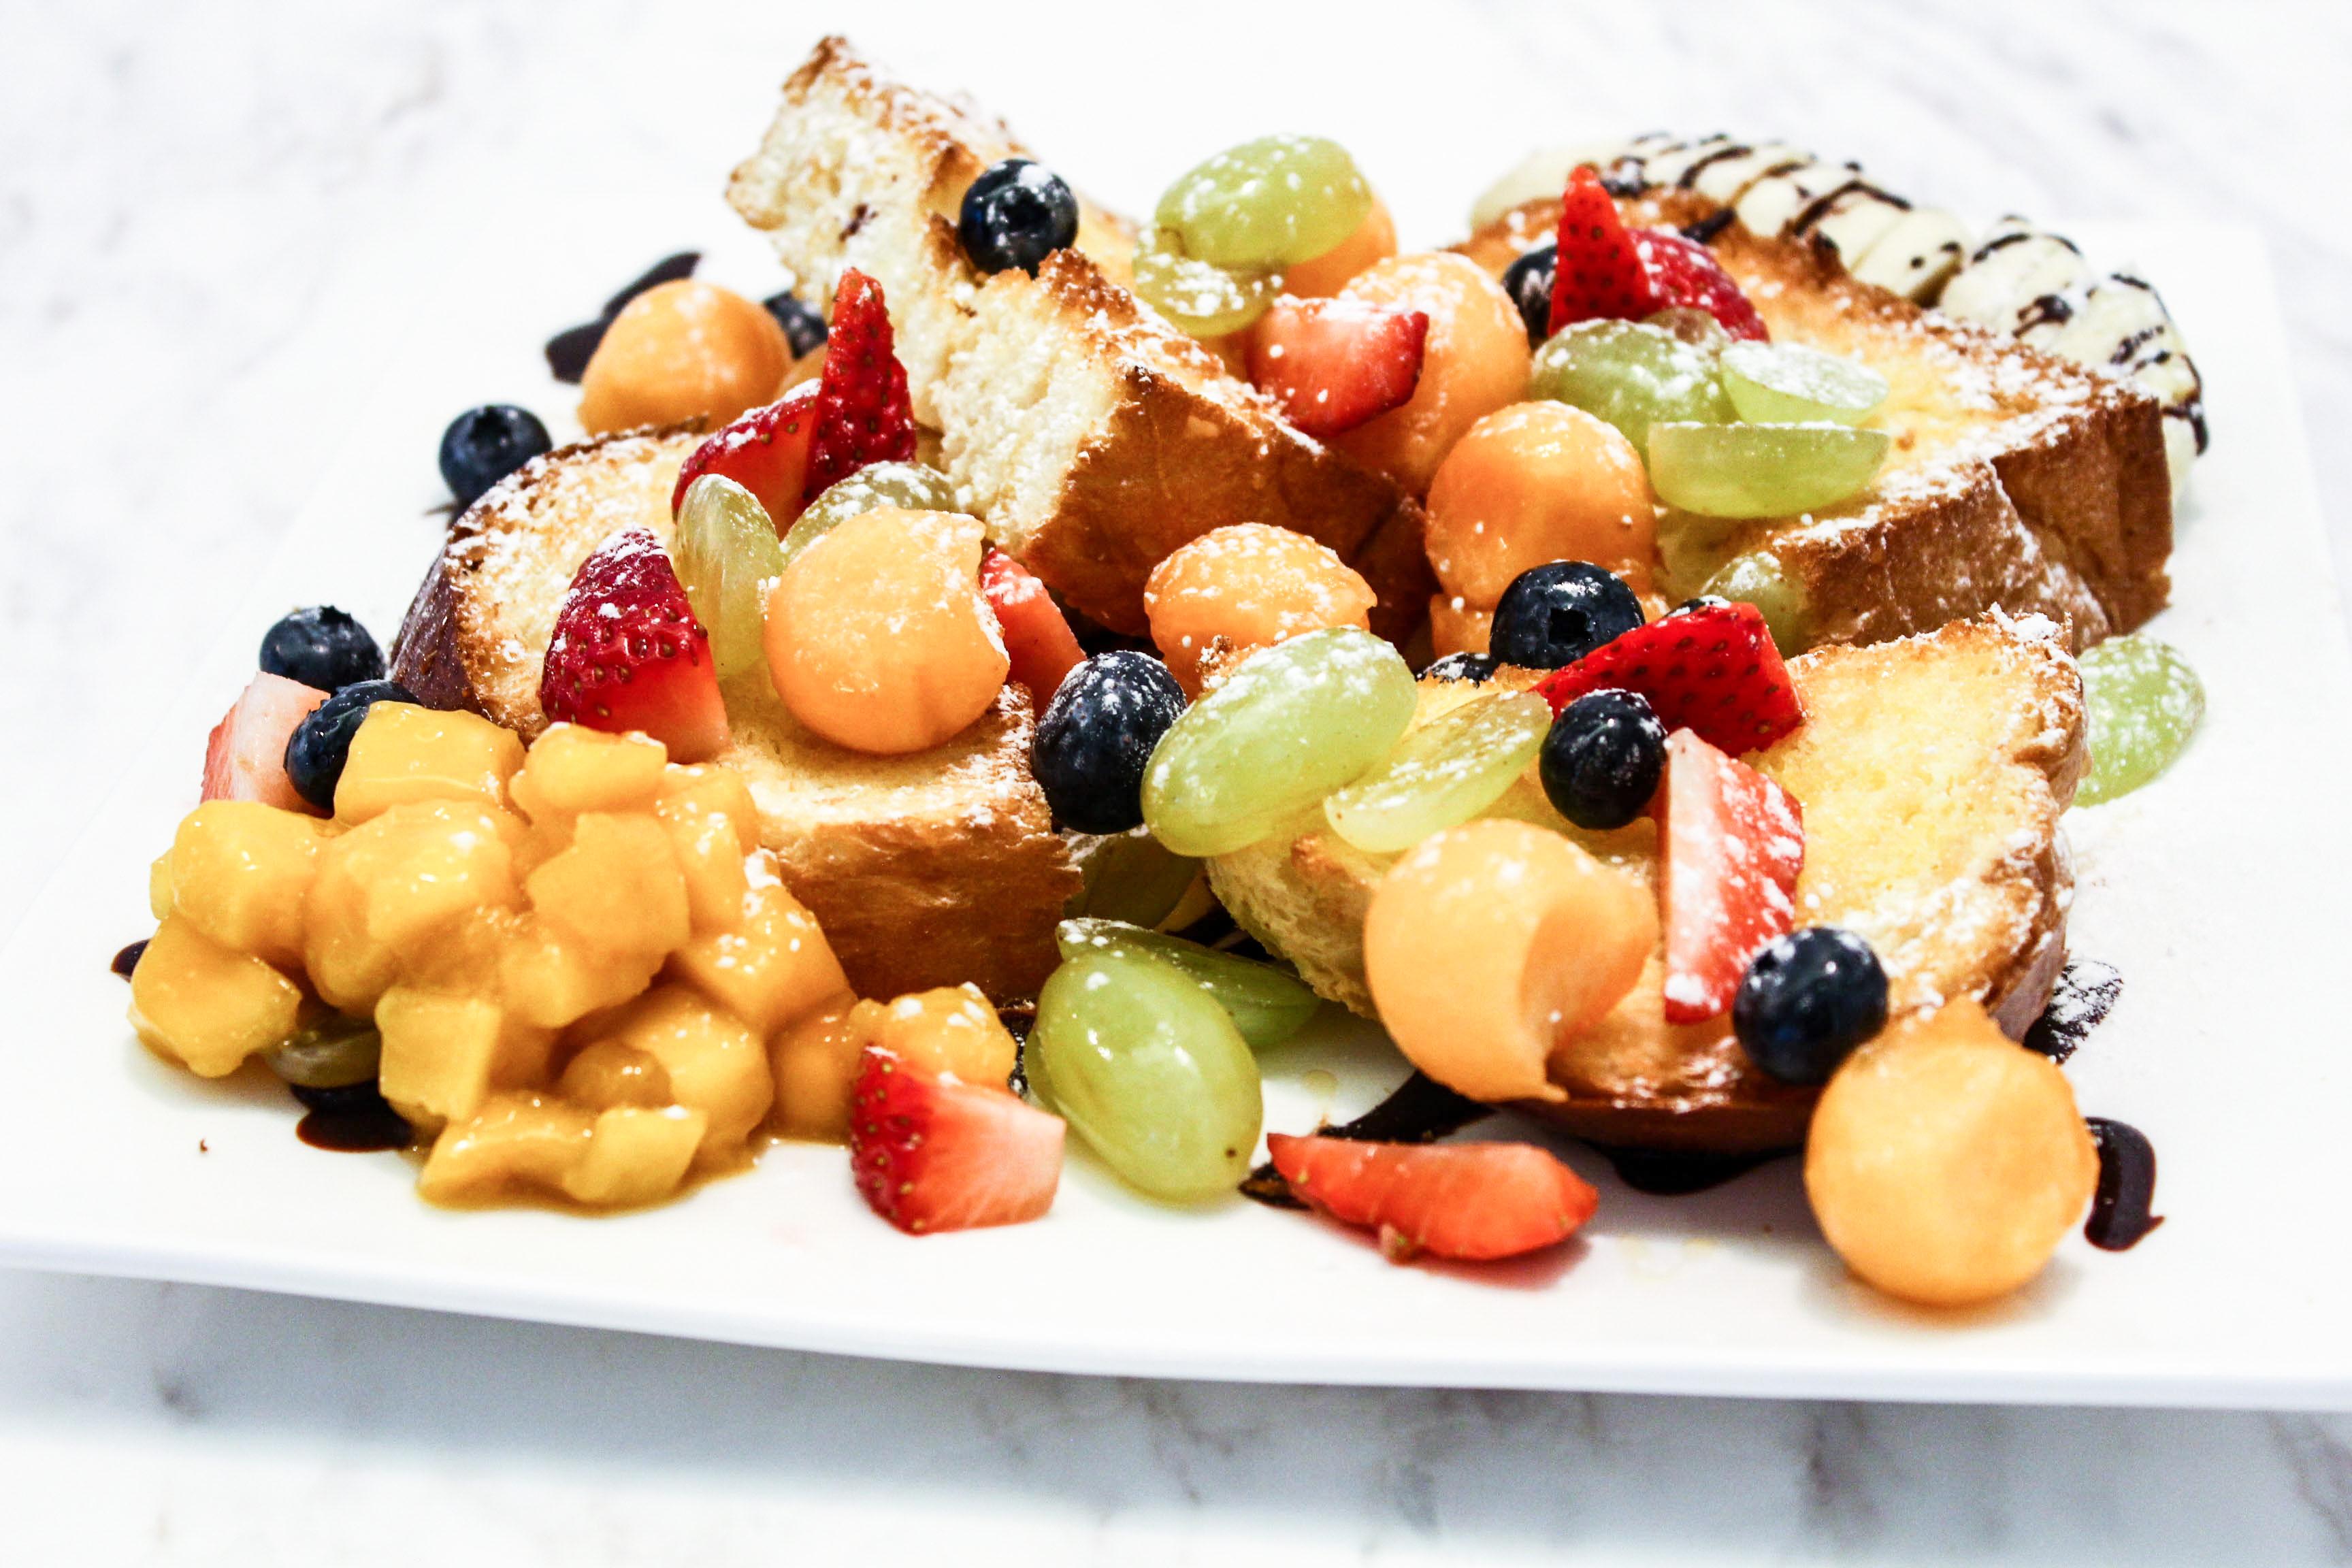 Bingki Cafe: Fruit Bread